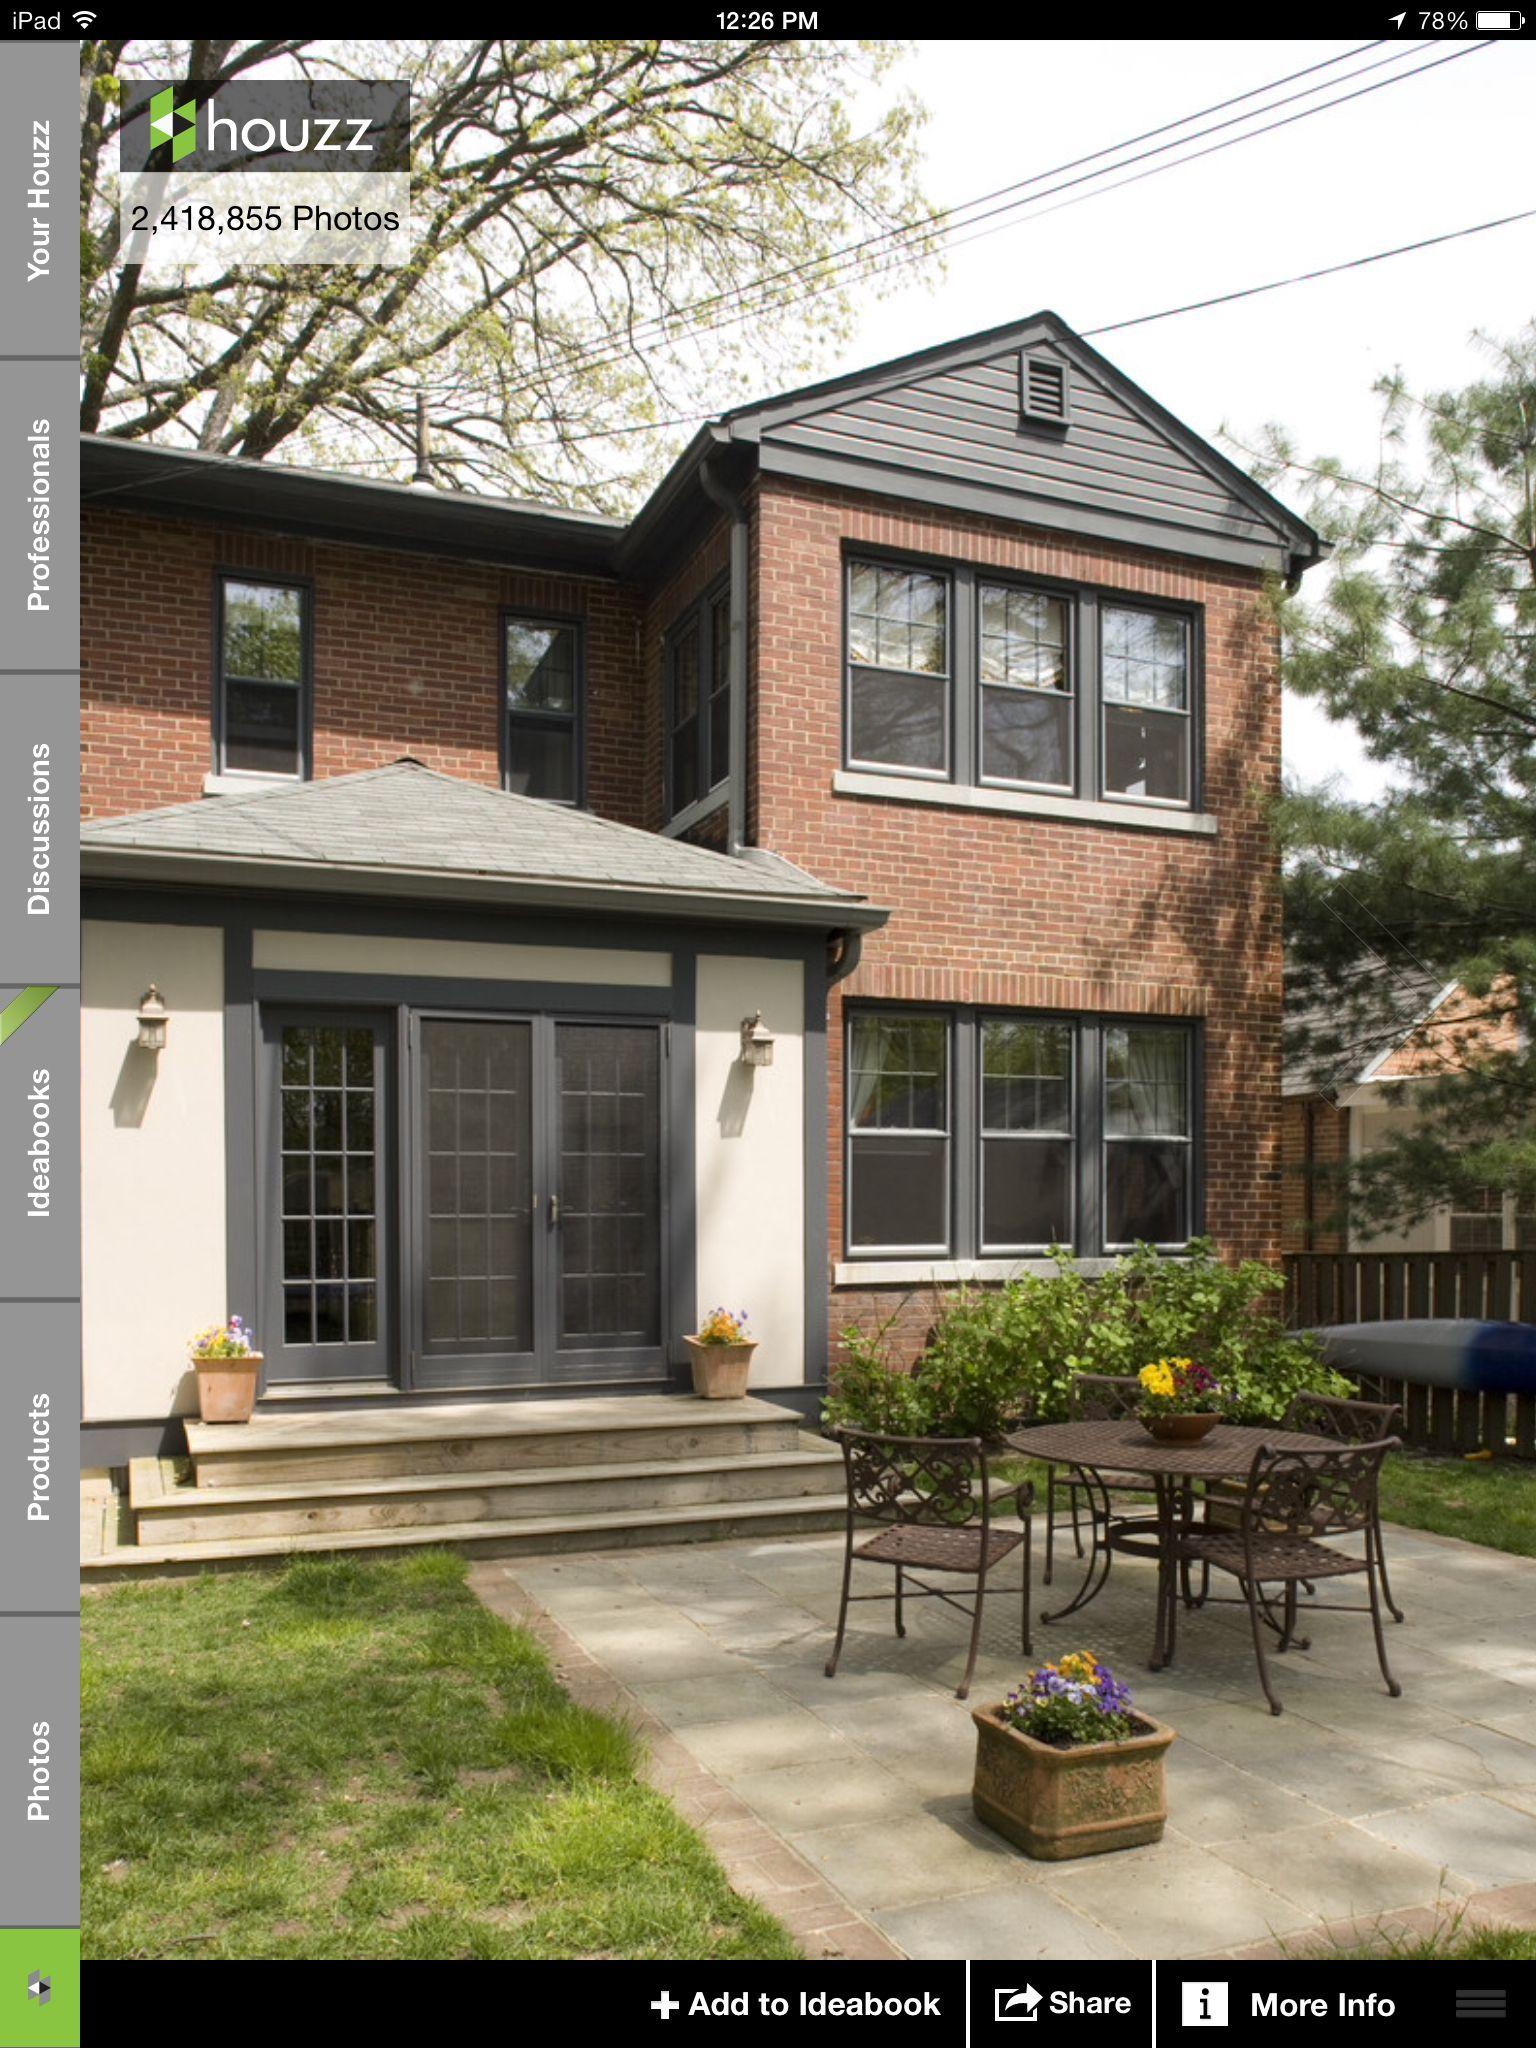 Home Exterior Design 5 Ideas 31 Pictures: Red Brick Exteriors